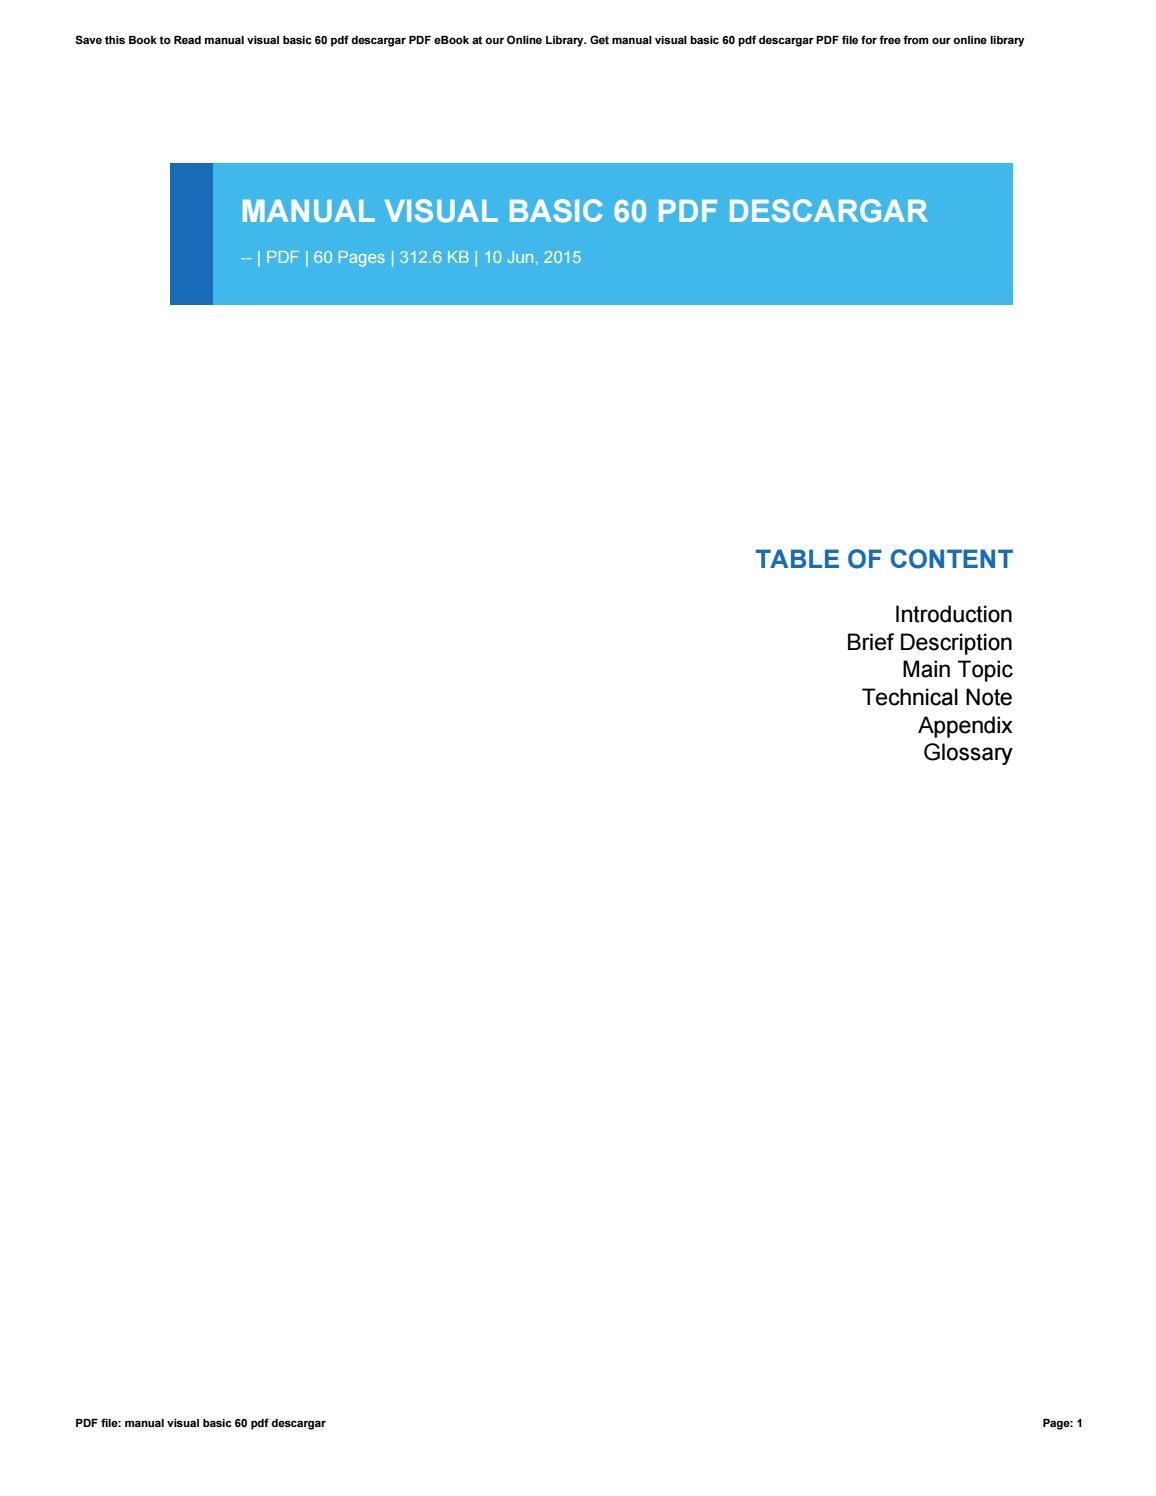 user manual visual basic 2015